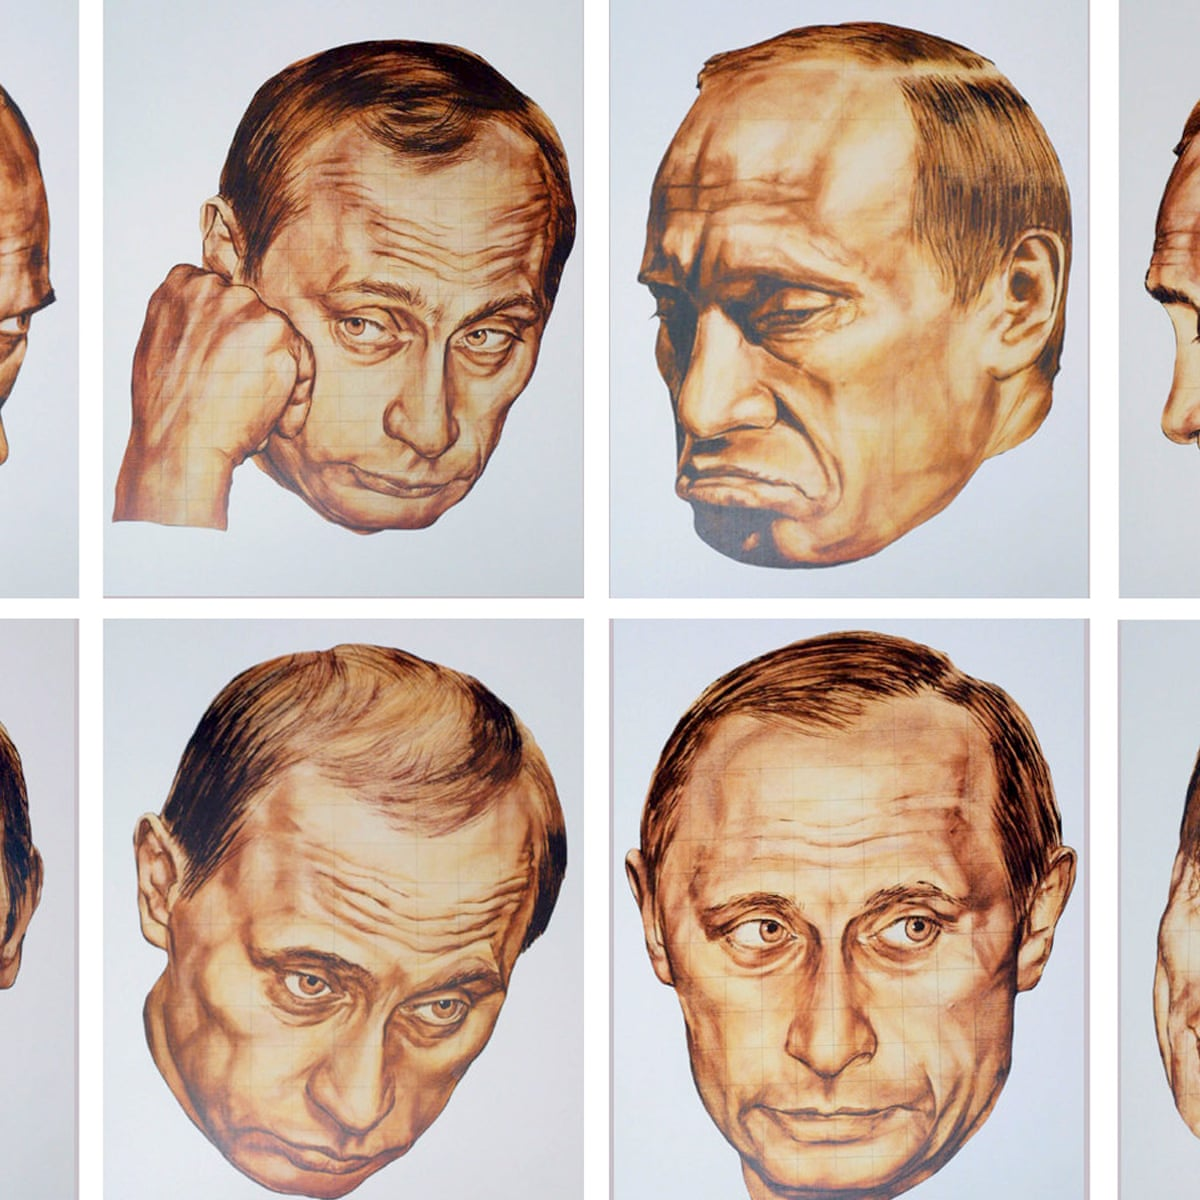 Killer Kleptocrat Genius Spy The Many Myths Of Vladimir Putin Vladimir Putin The Guardian